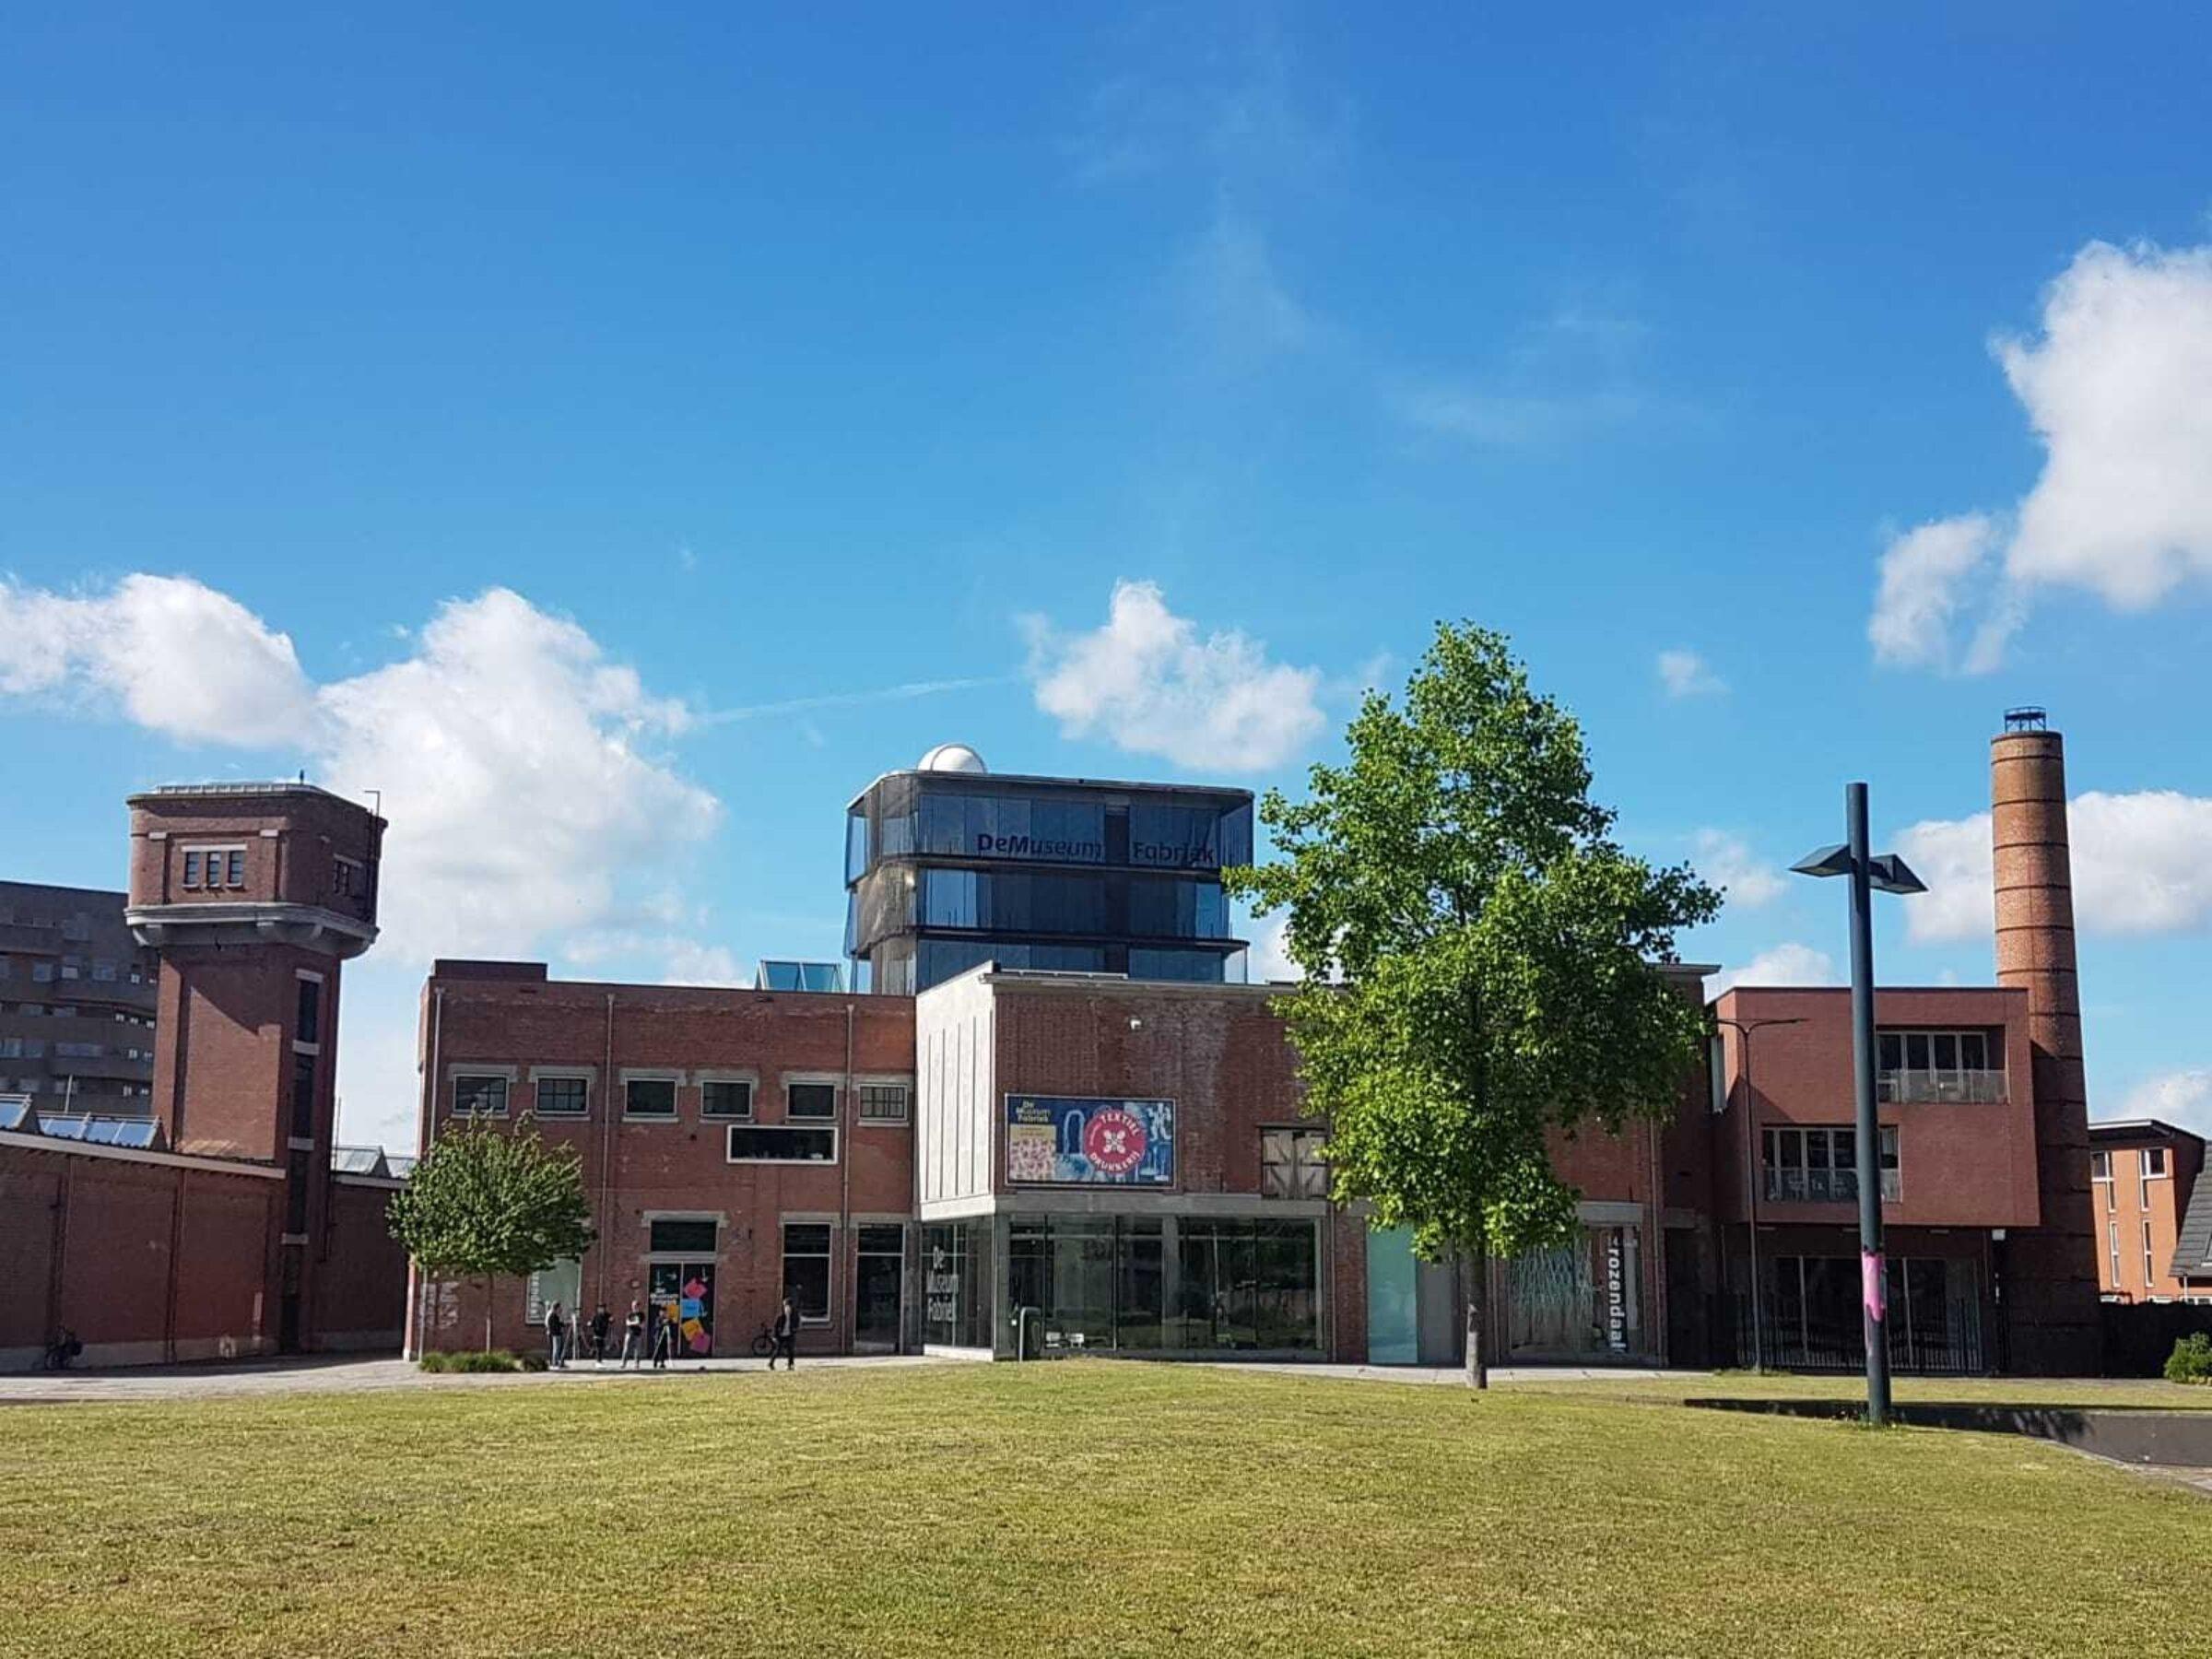 2019 De Museumfabriek 2